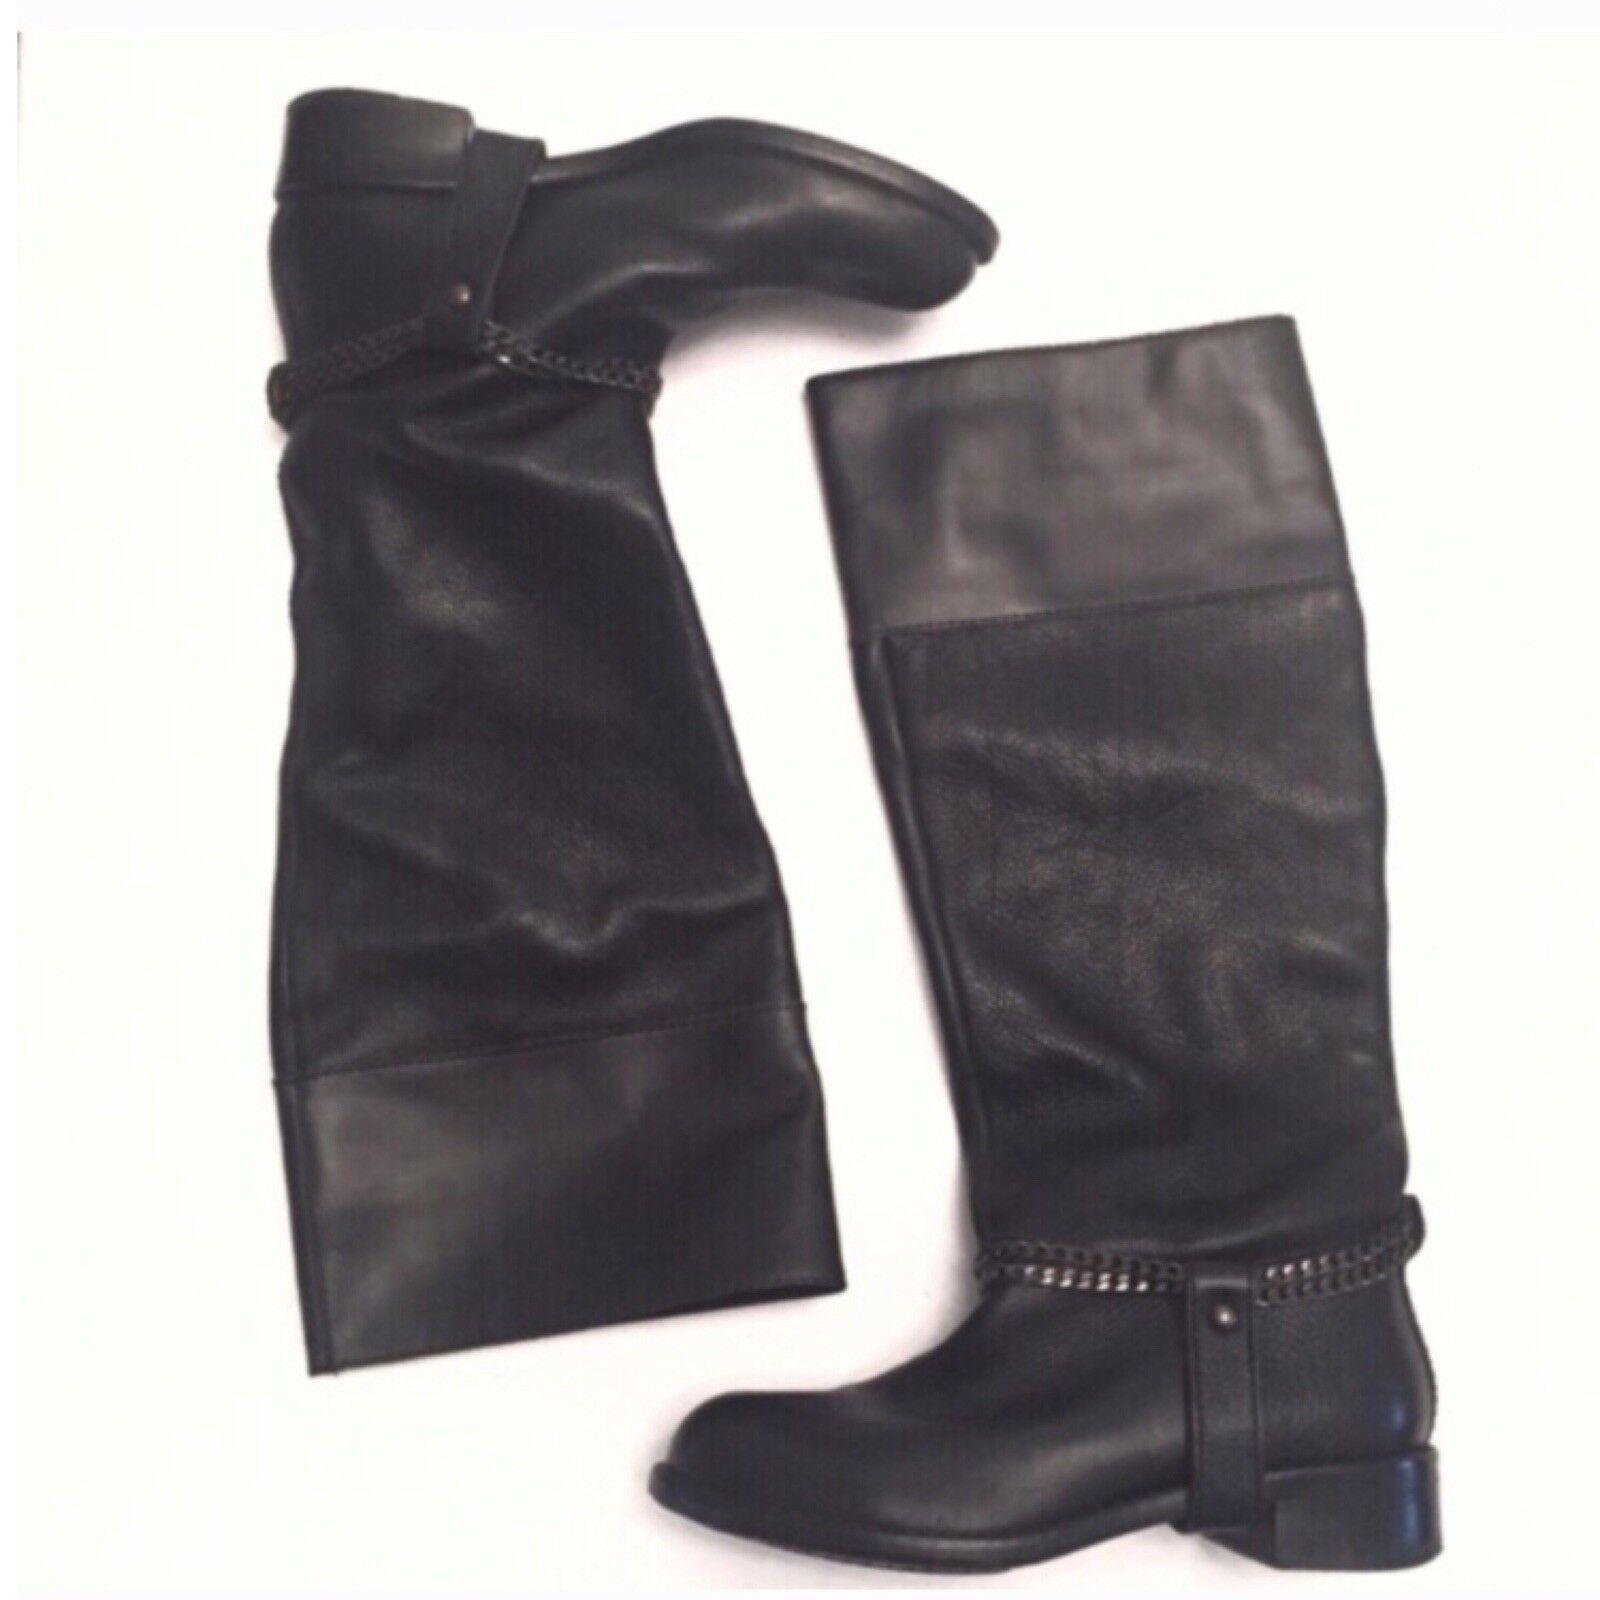 DKNY Donna Karan Tall Black Leather Chain Boots 7